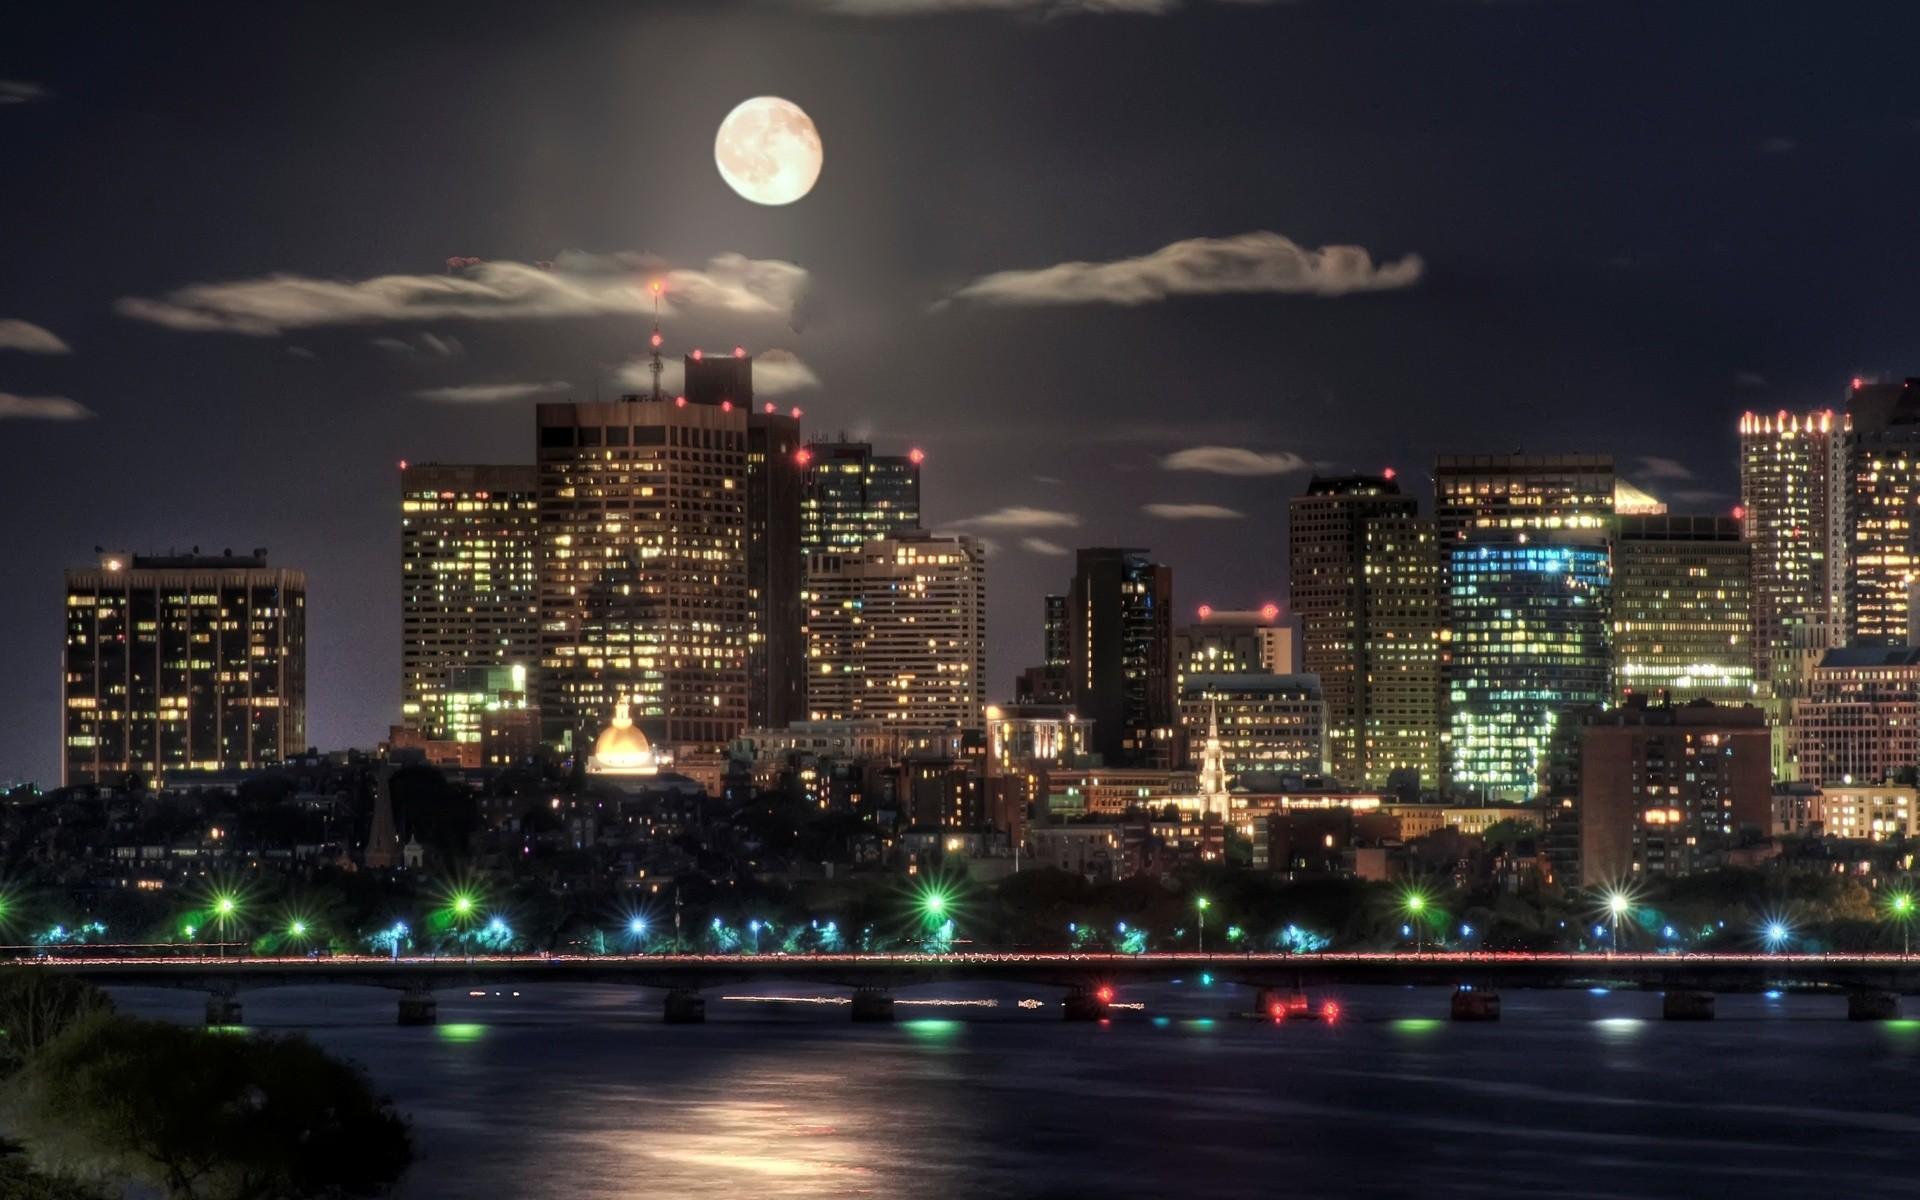 Image detail for -Wallpaper night, city, lights, moon | HD Desktop  Wallpapers